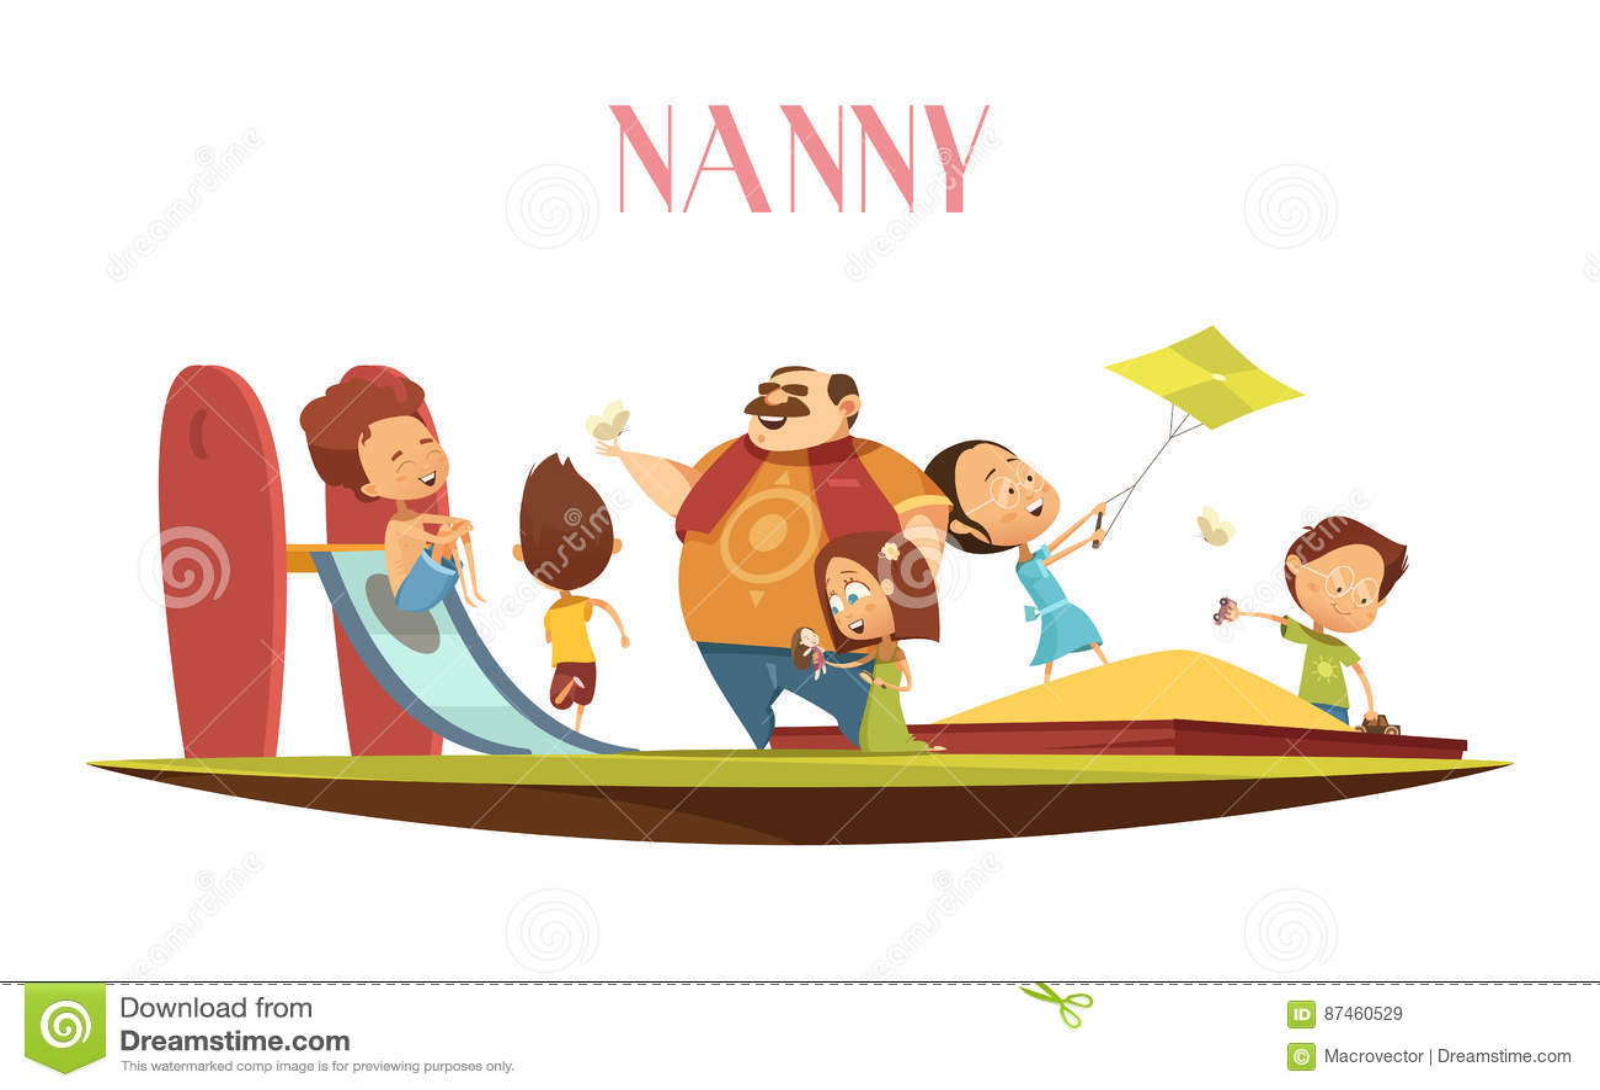 babysitter cartoons  illustrations  u0026 vector stock images